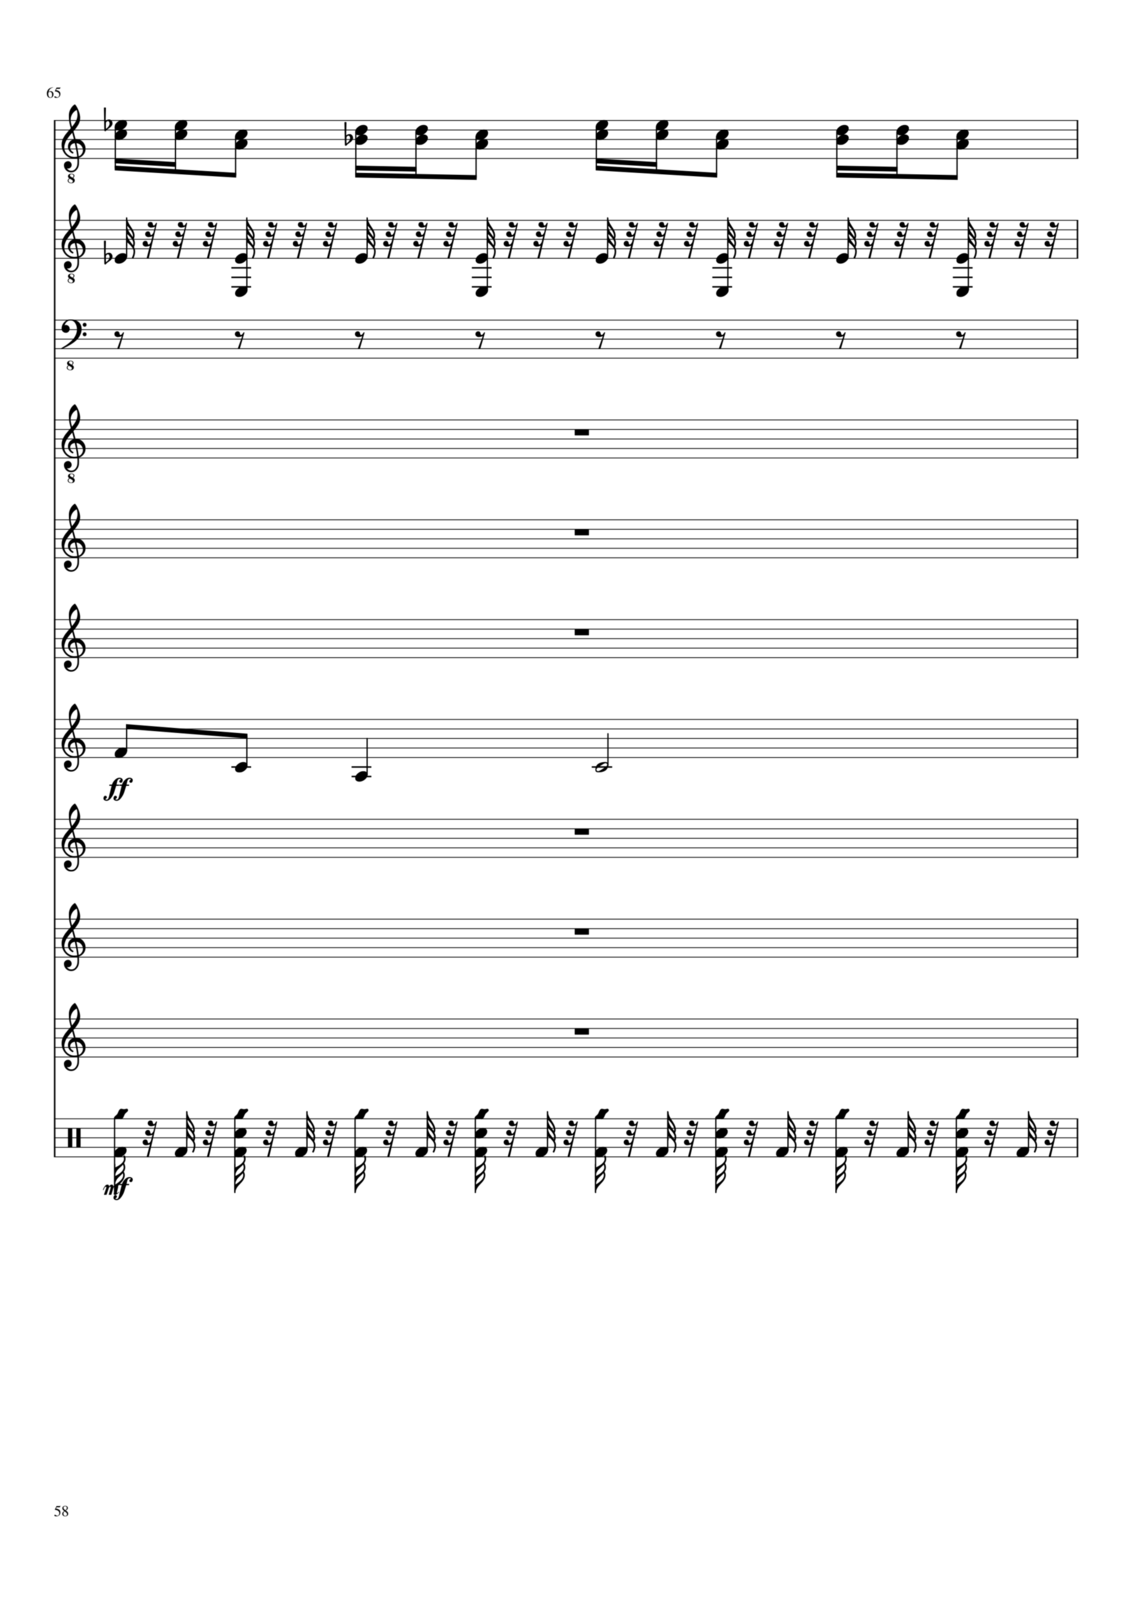 Belyiy sokol slide, Image 58